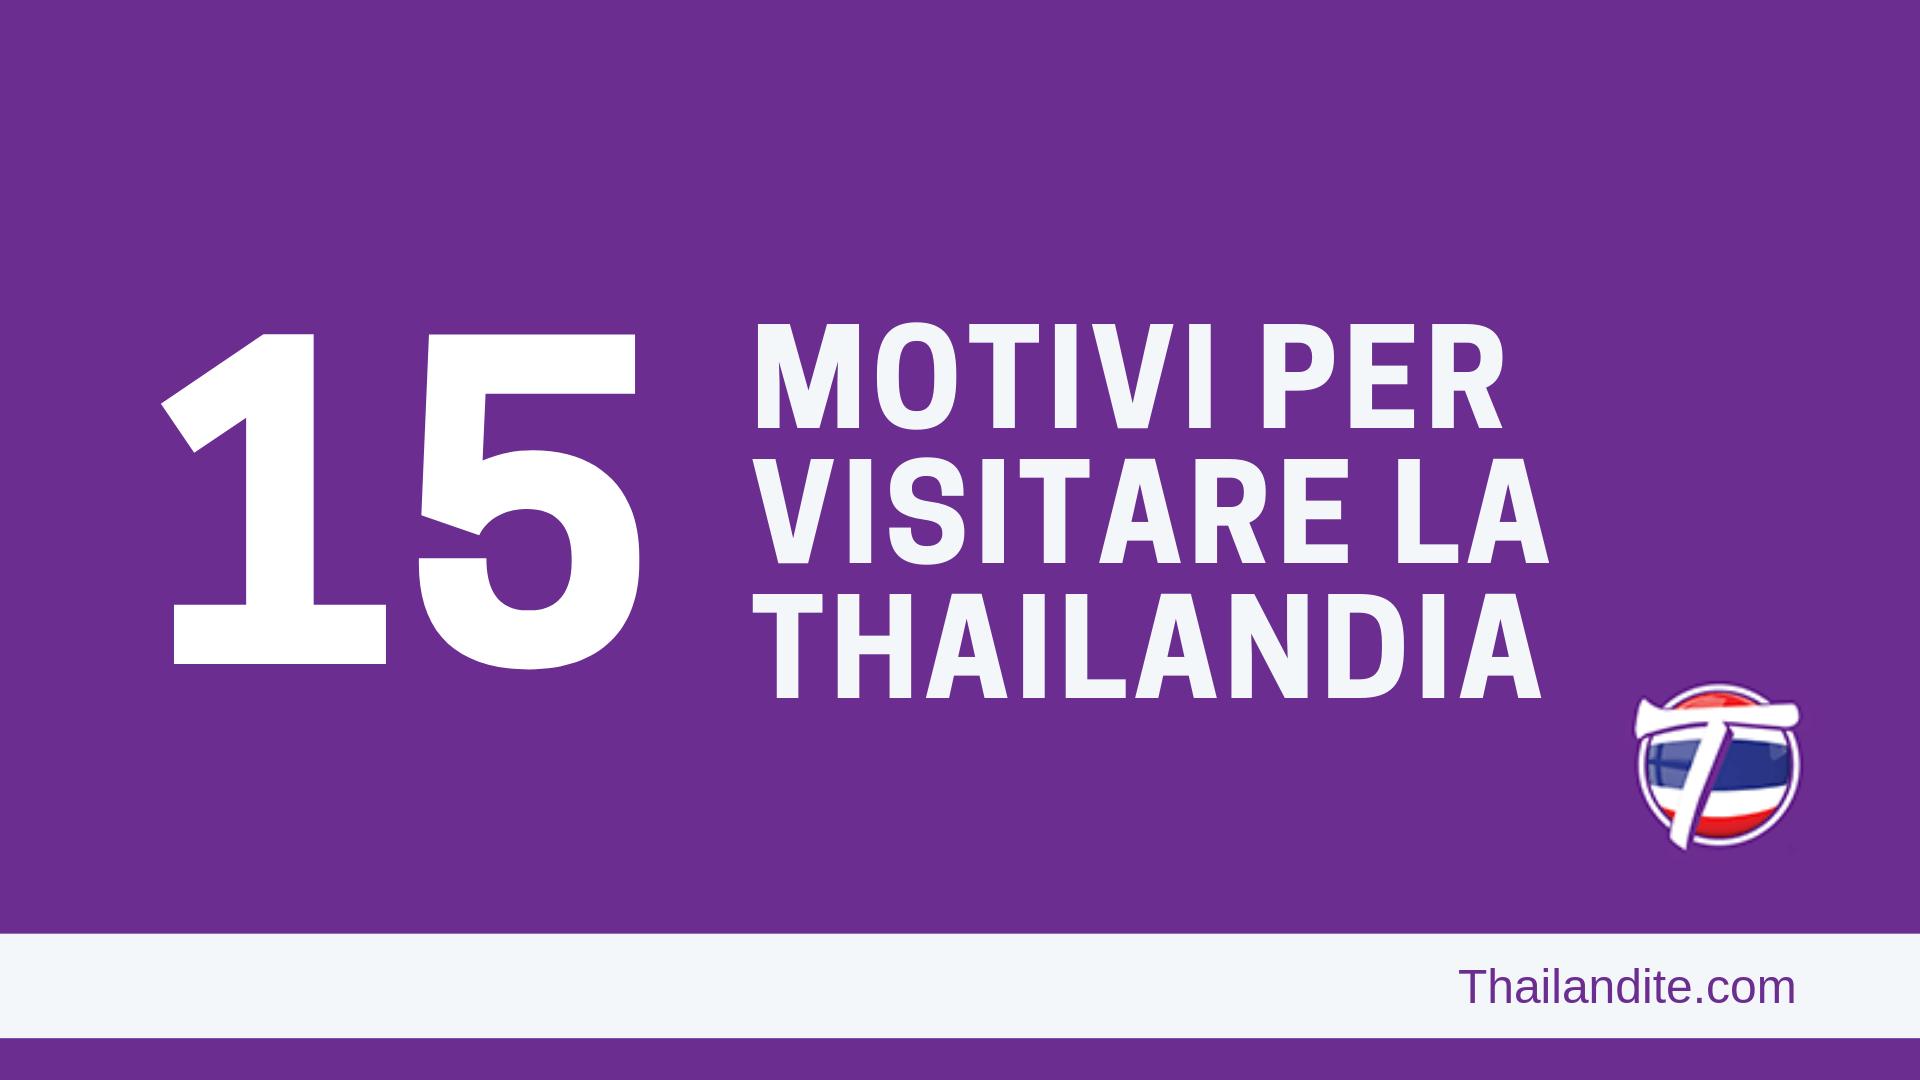 15 motivi per visitare la Thailandia